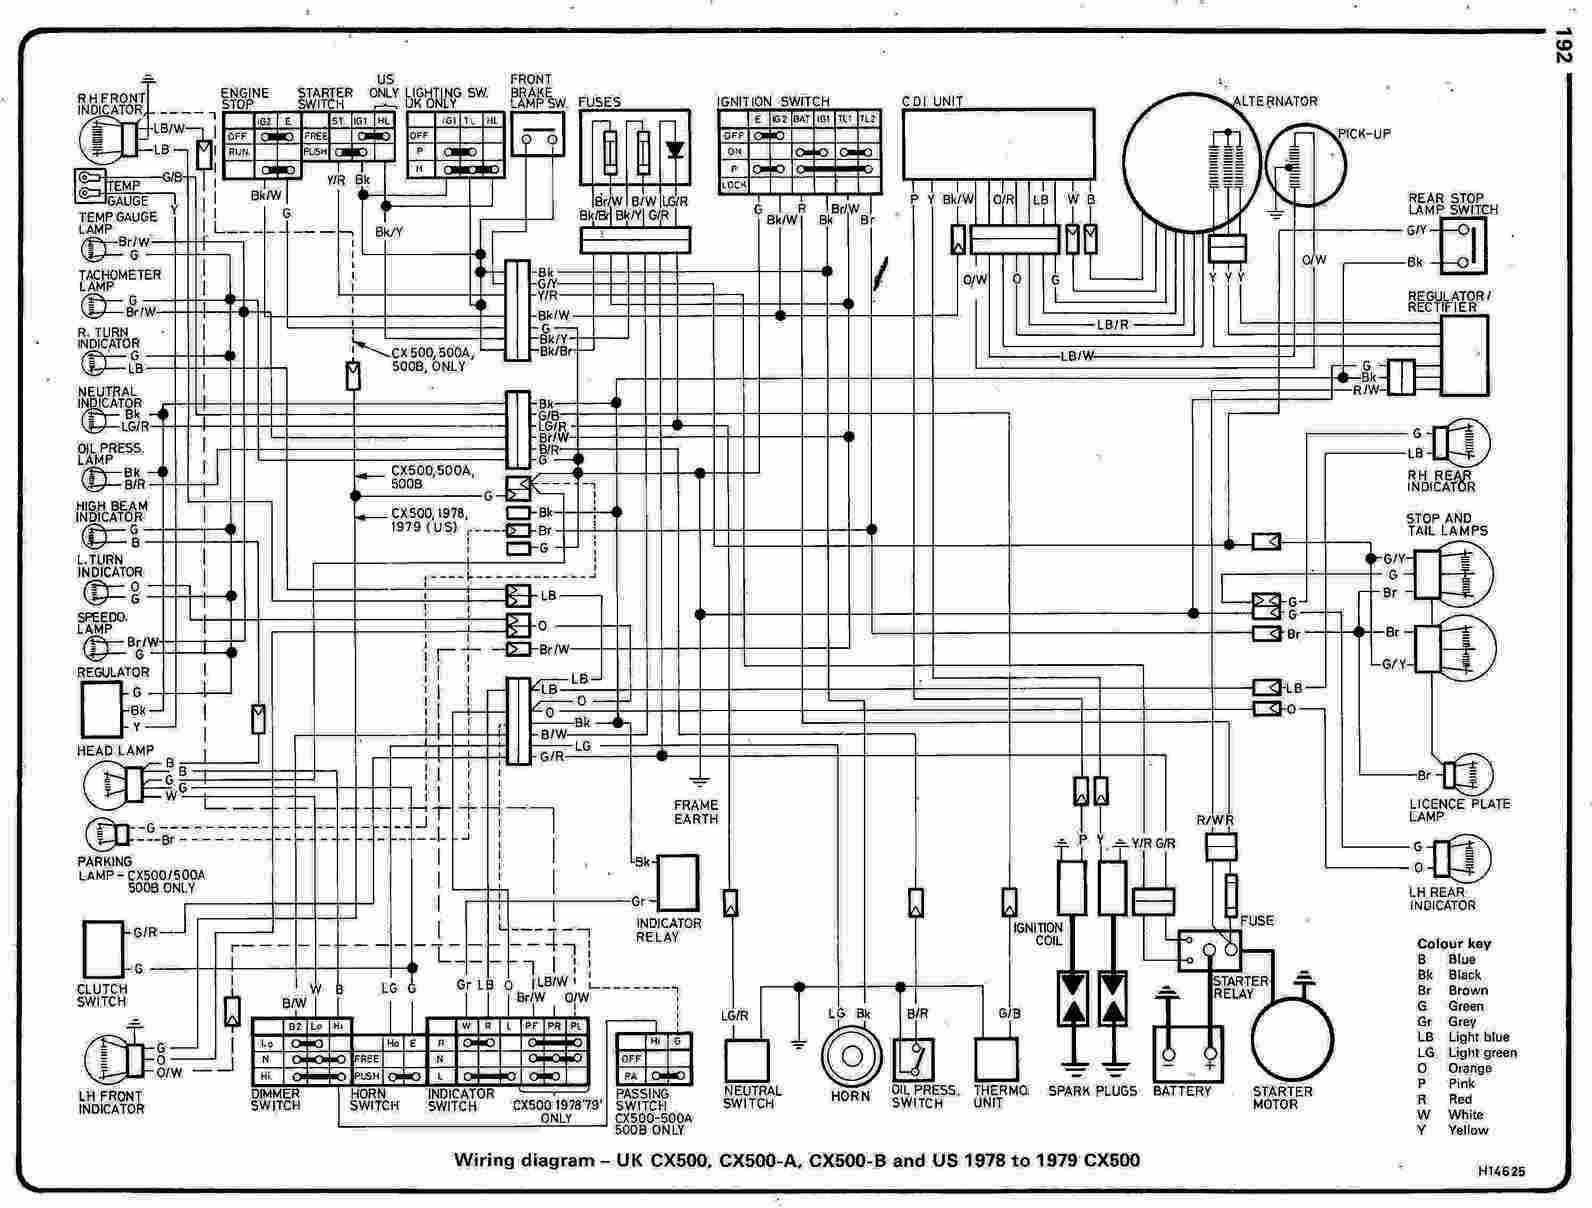 medium resolution of 81 honda wiring diagram wiring diagram blog 81 honda gl500 wiring diagram 81 honda wiring diagram